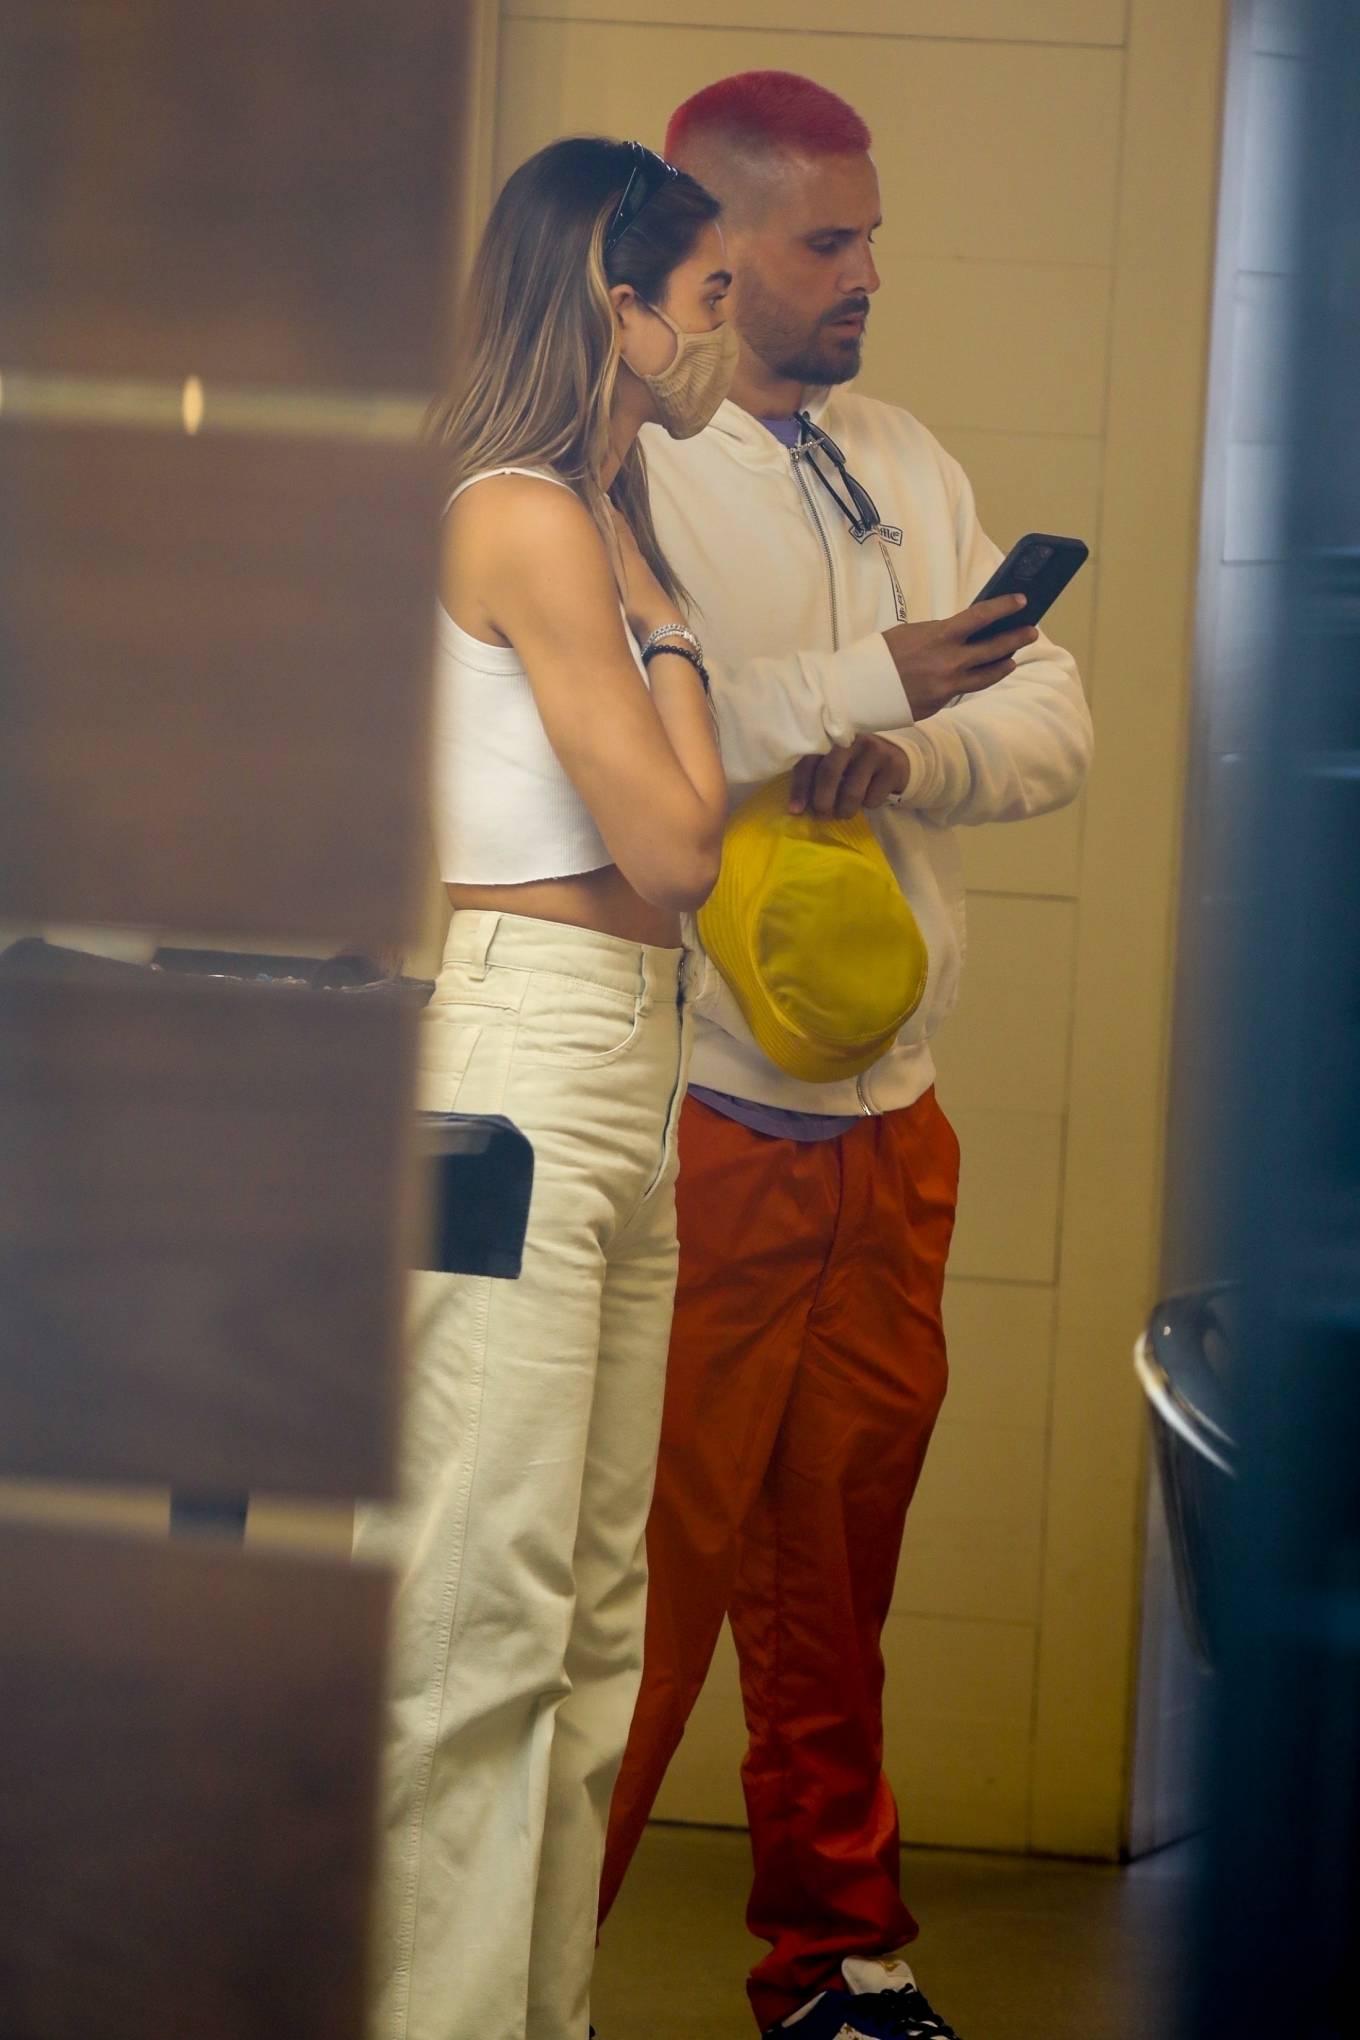 Amelia Hamlin 2021 : Amelia Hamlin – Seen with Scott Disick as they visit Meche Salon in Beverly Hills-02